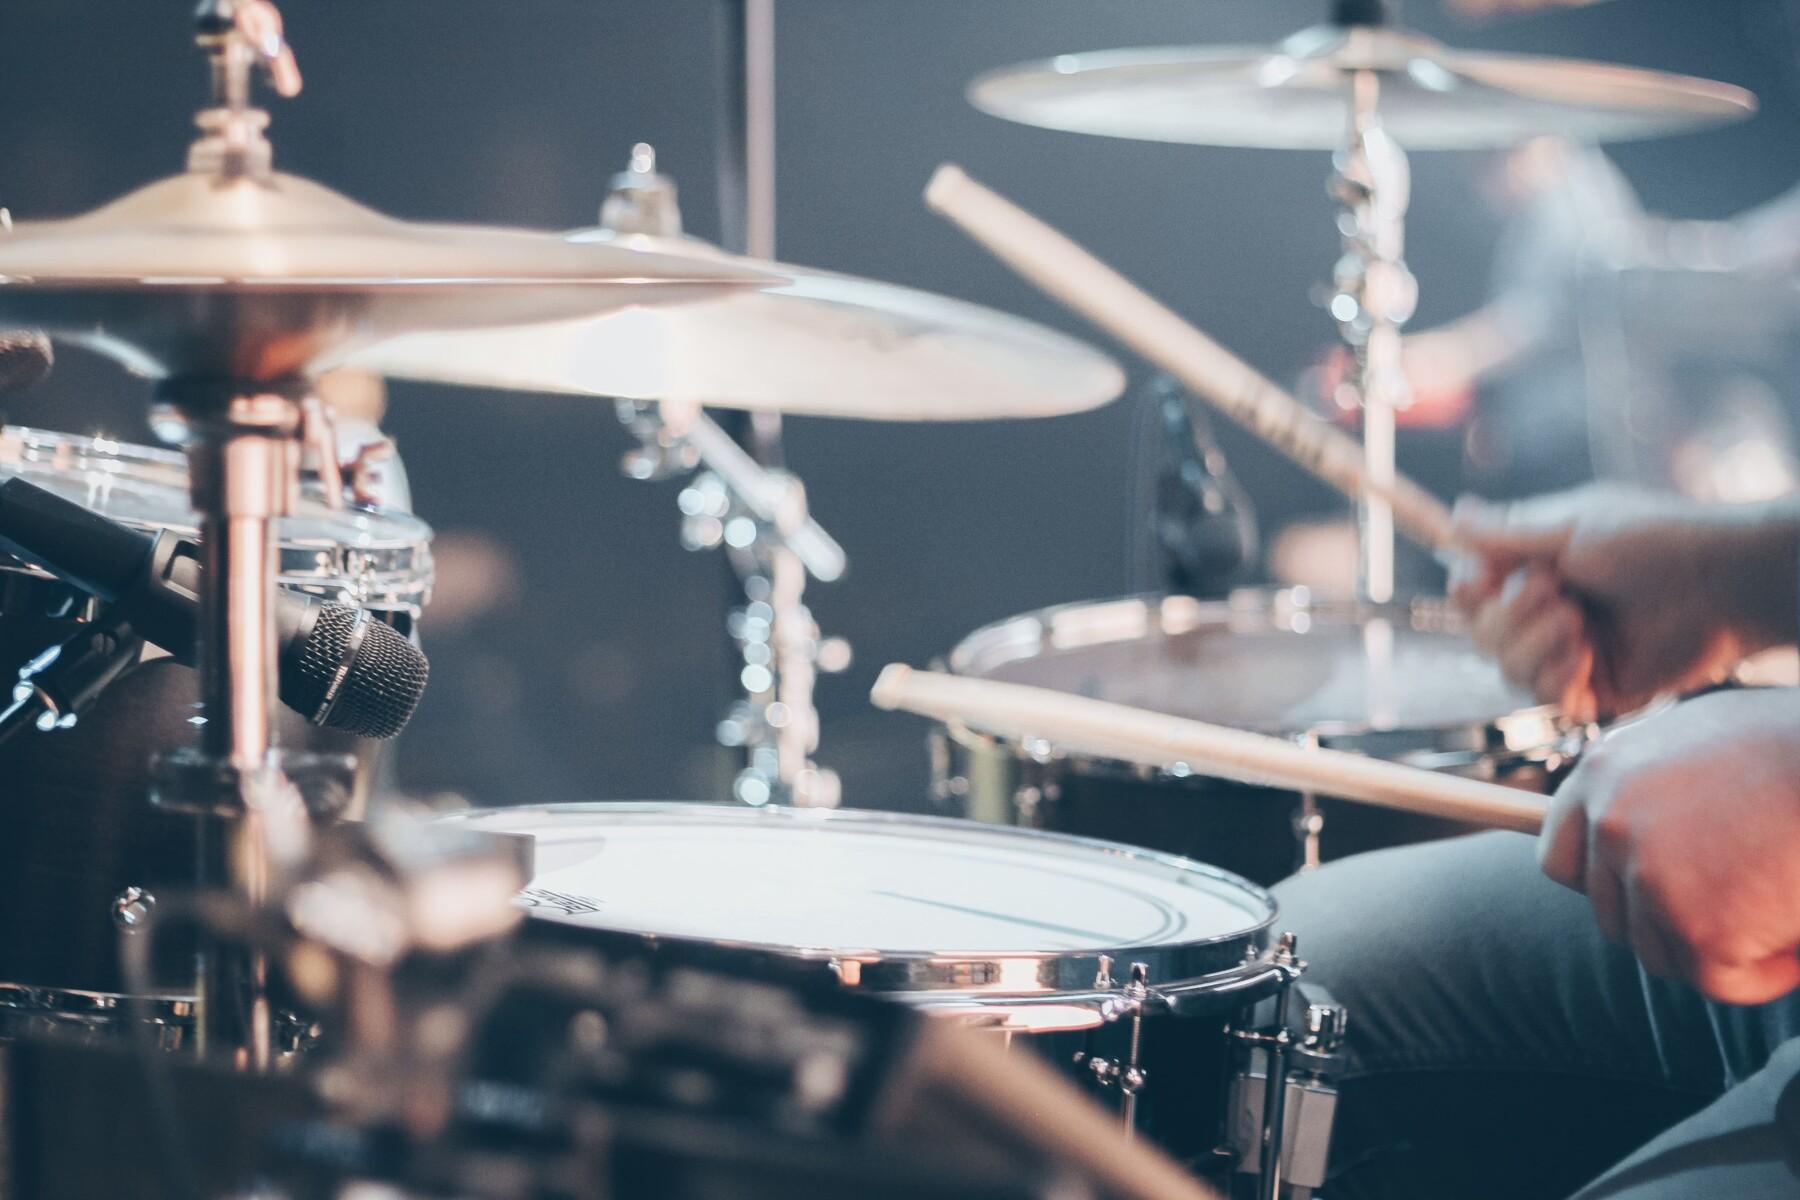 Foto van bands en drums